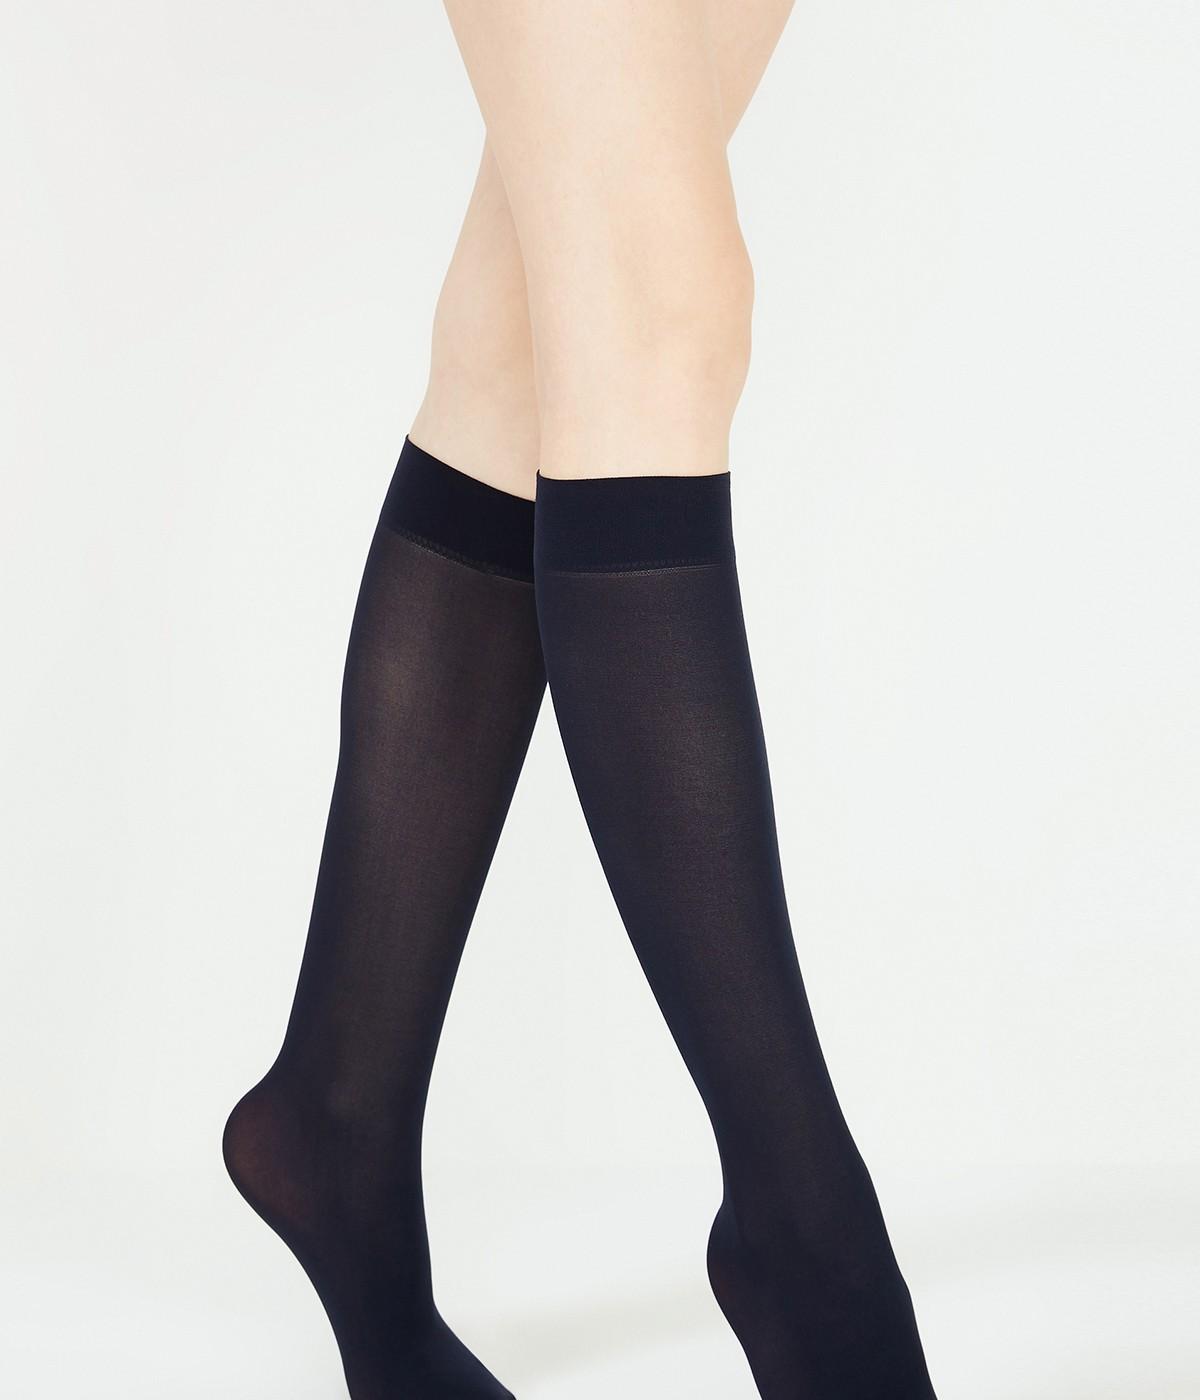 Micro 40 Knee High Socks